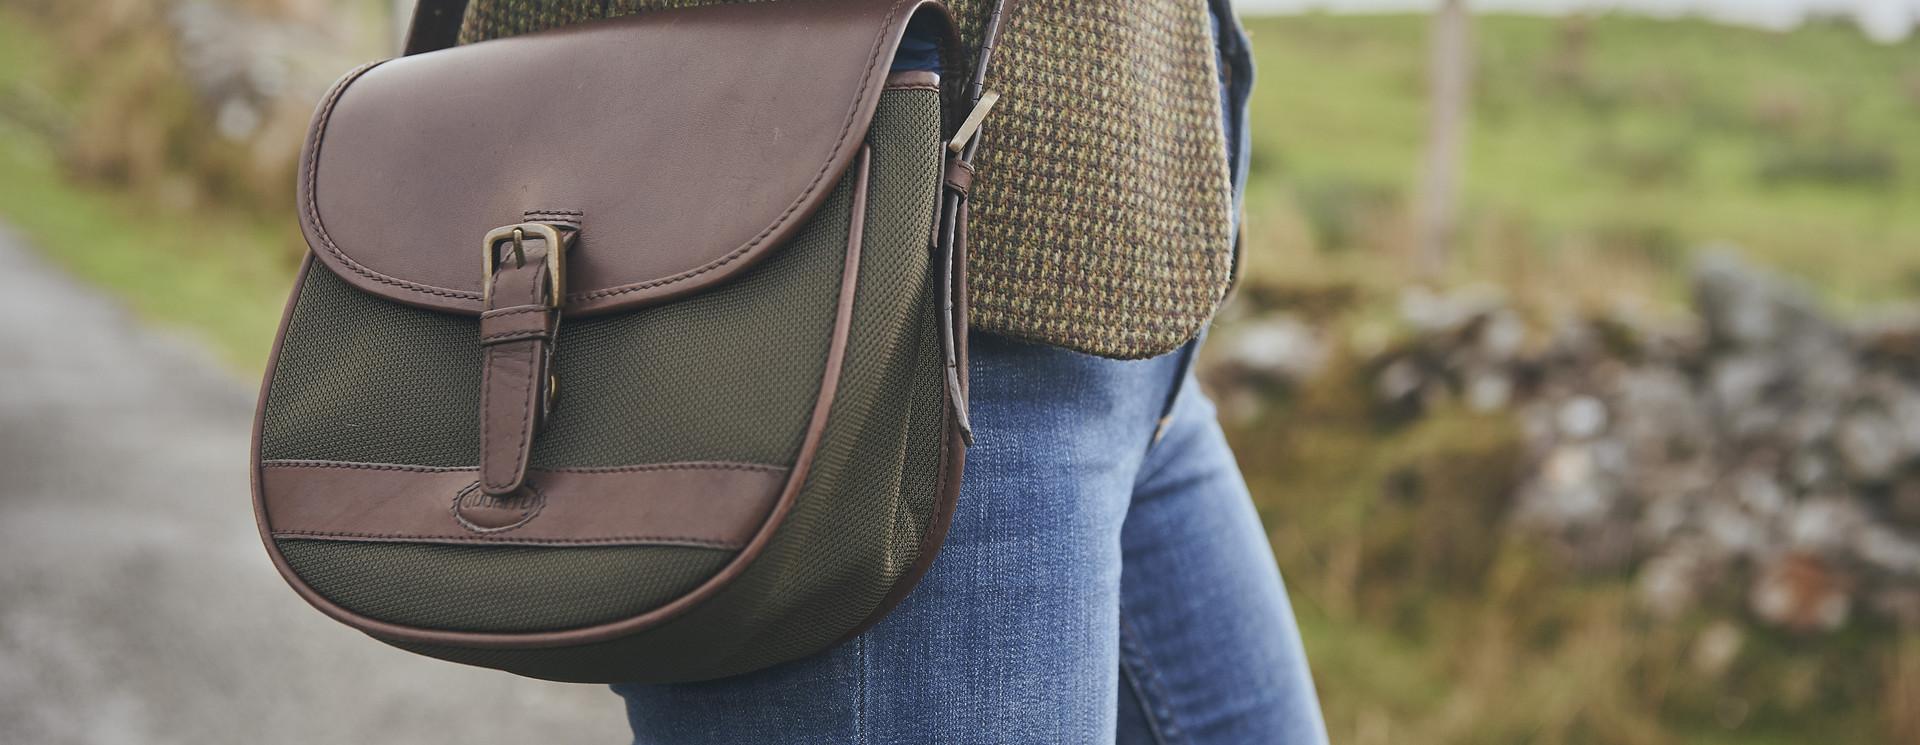 Luggage, Handbags & Purses